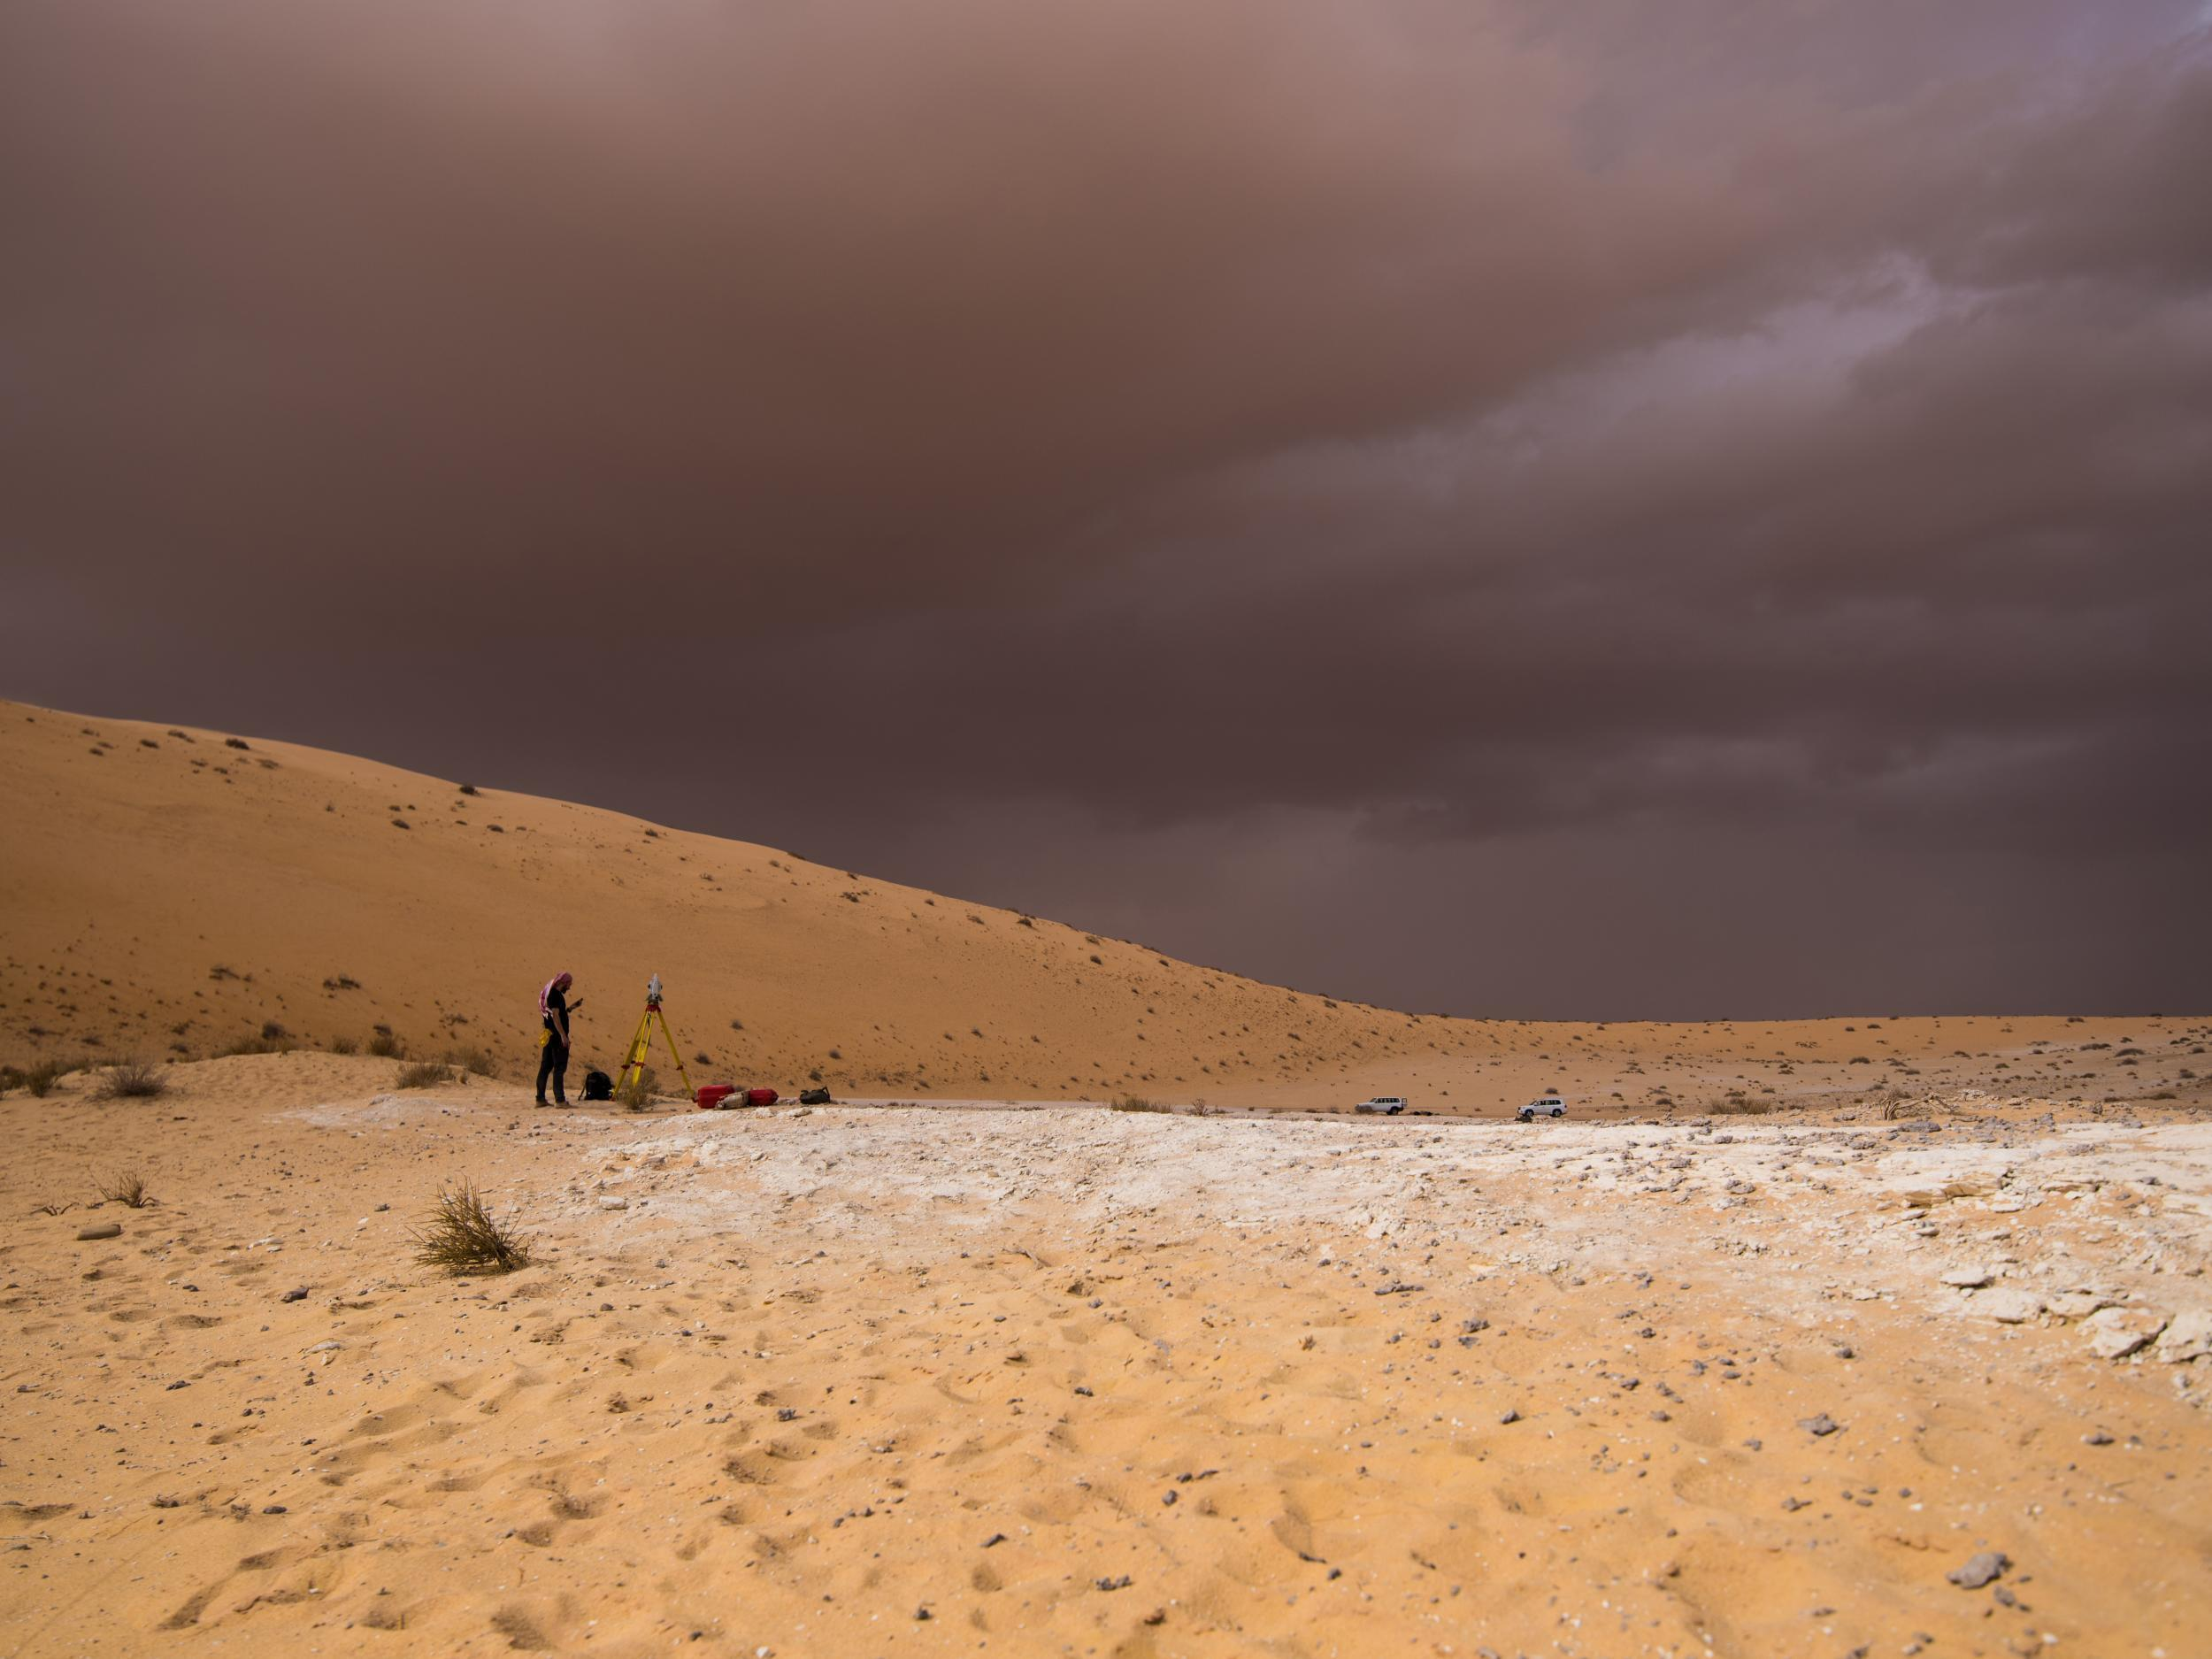 Finger found in Saudi Arabian desert reveals secrets of early human  migration  387dc9e4a4b